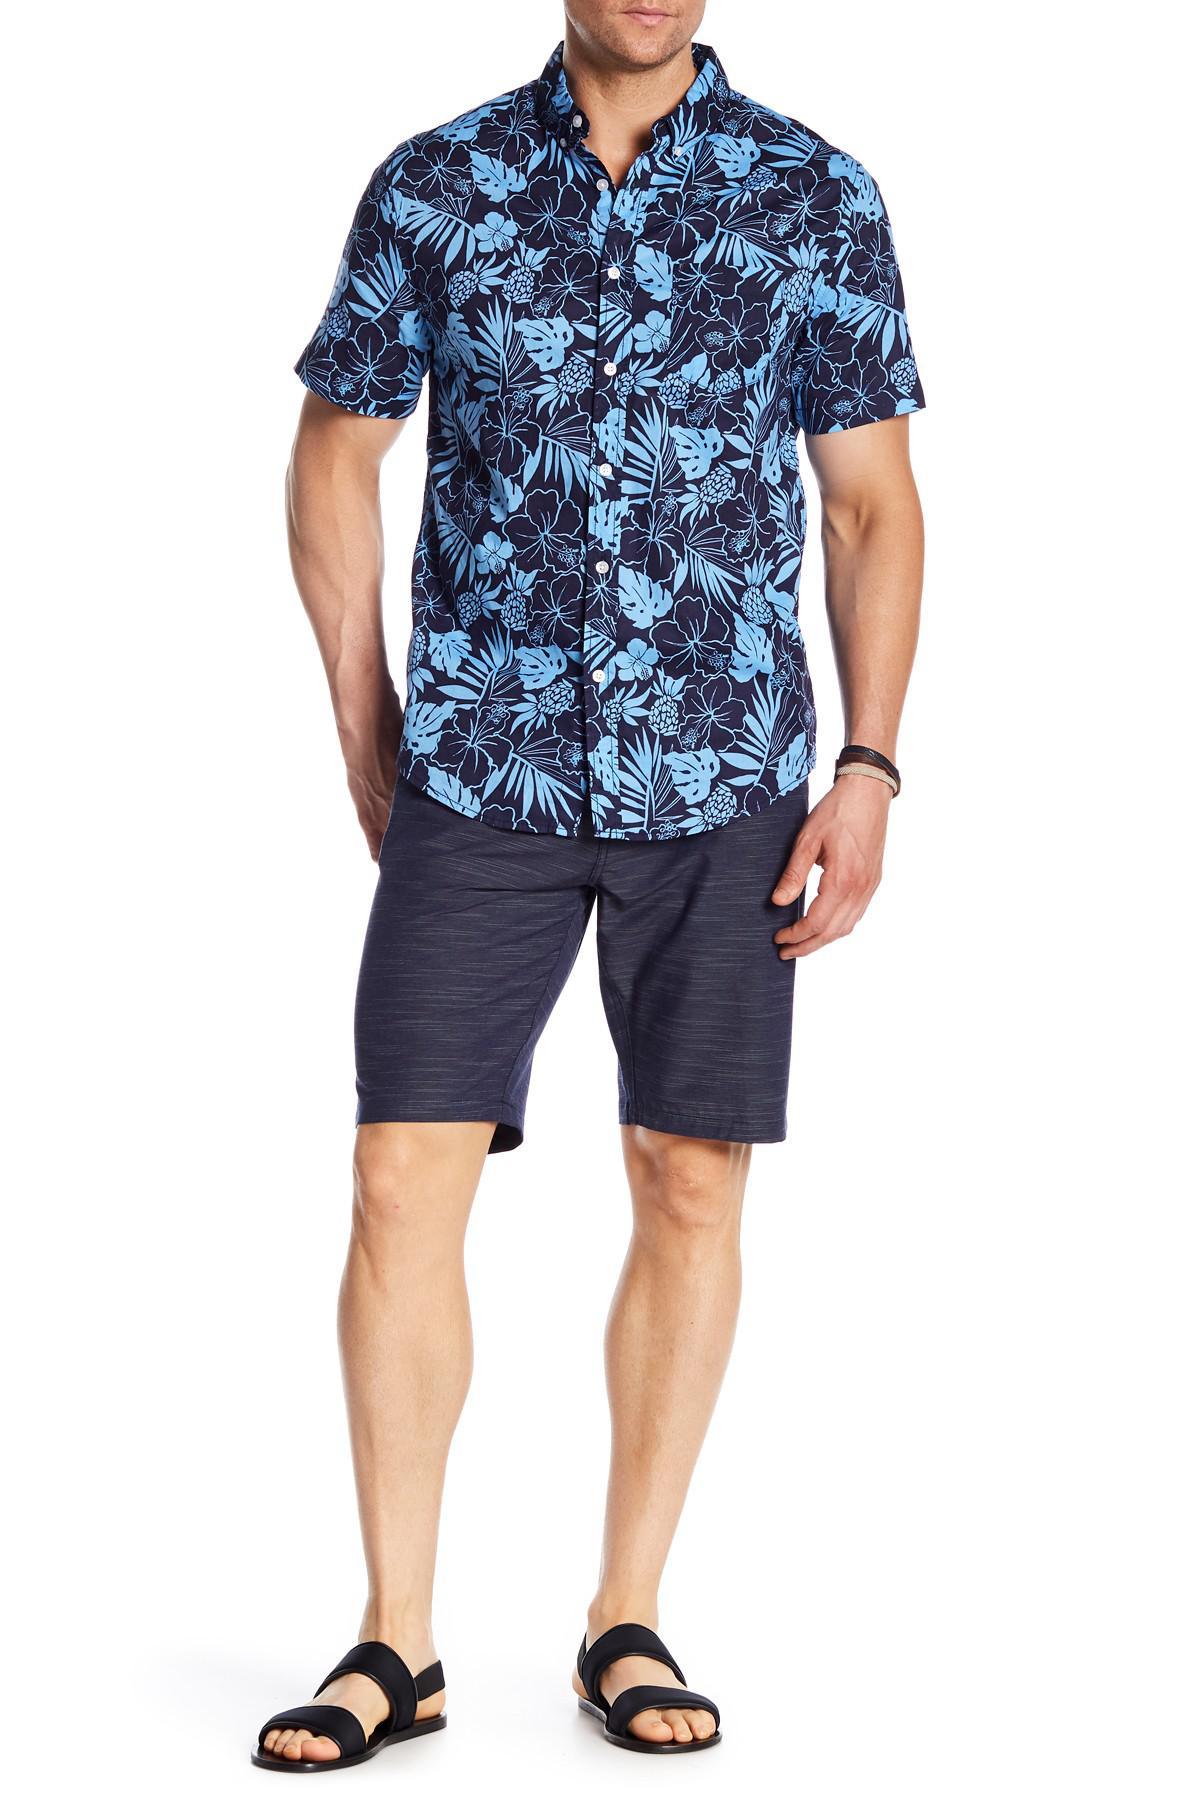 2551d1479e TRUNKS SURF AND SWIM CO Multi Functional Shorts in Blue for Men - Lyst